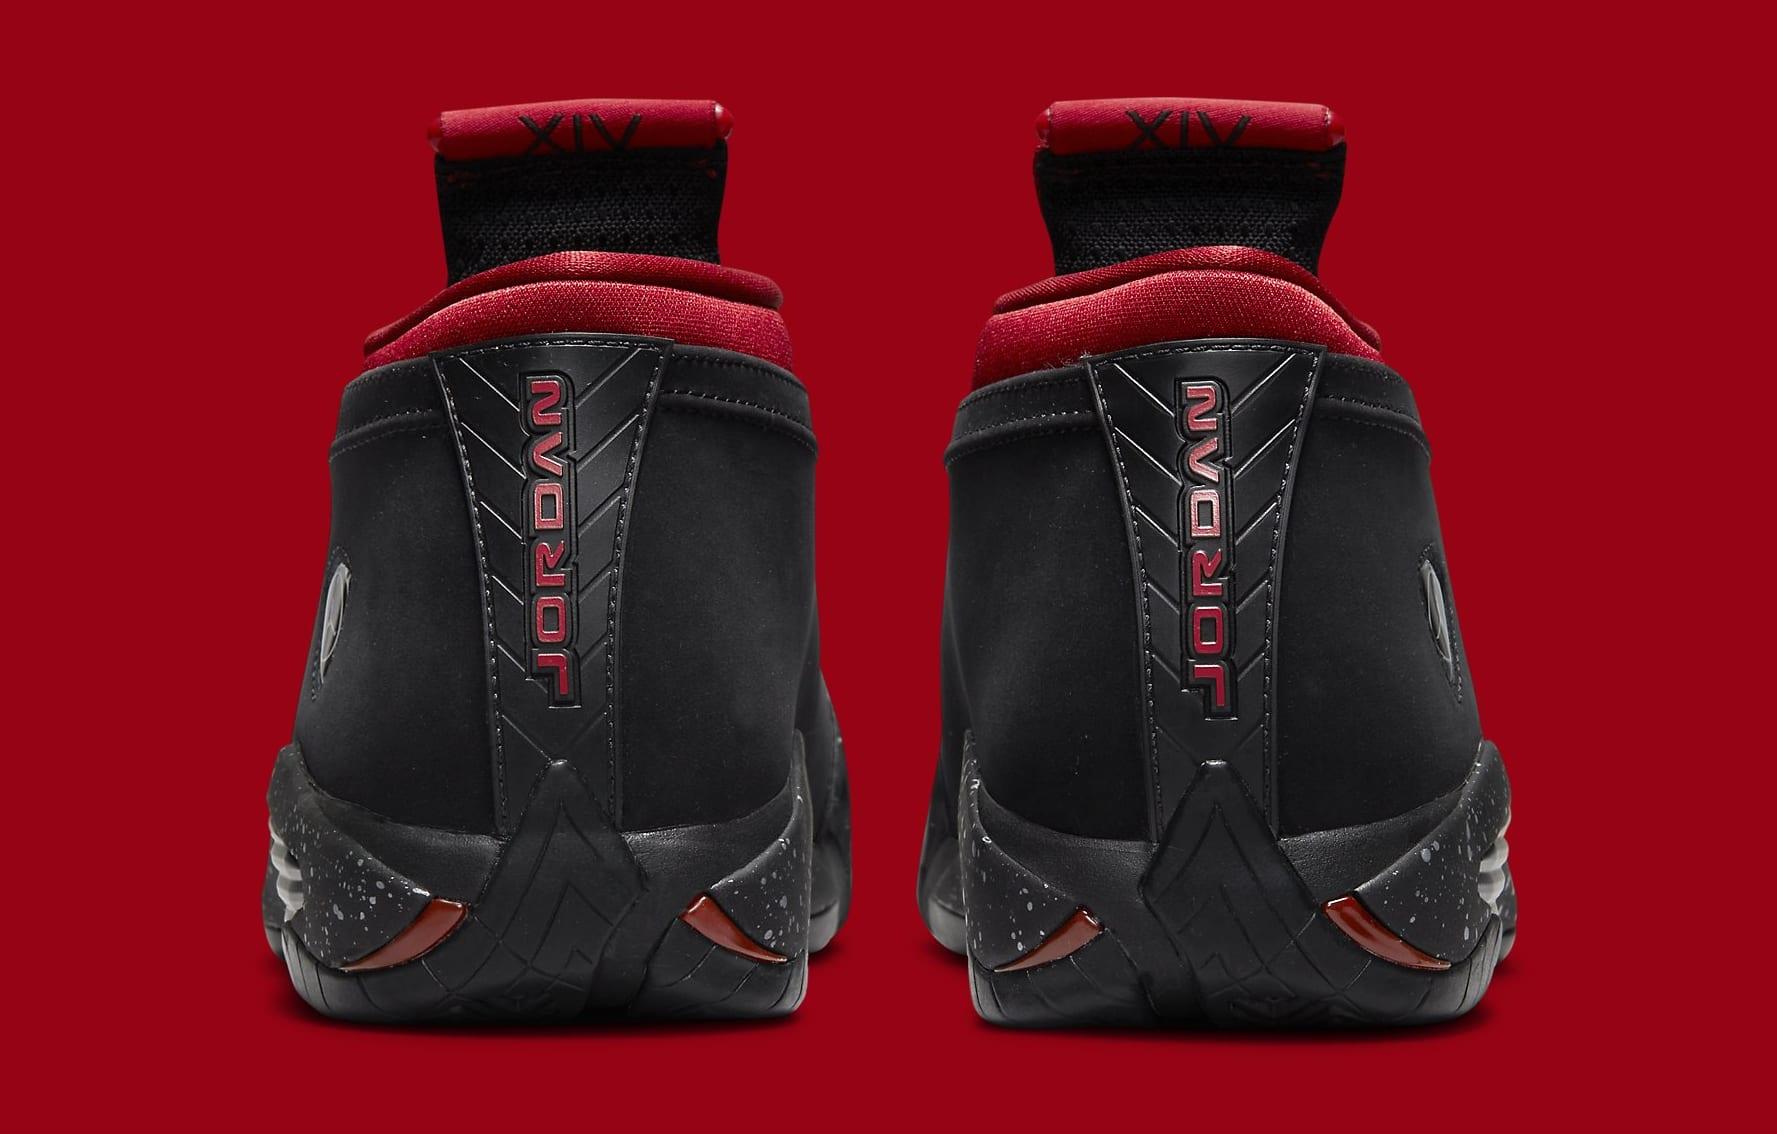 Air Jordan 14 Low Women's 'Red Lipstick' DH4121-006 Heel